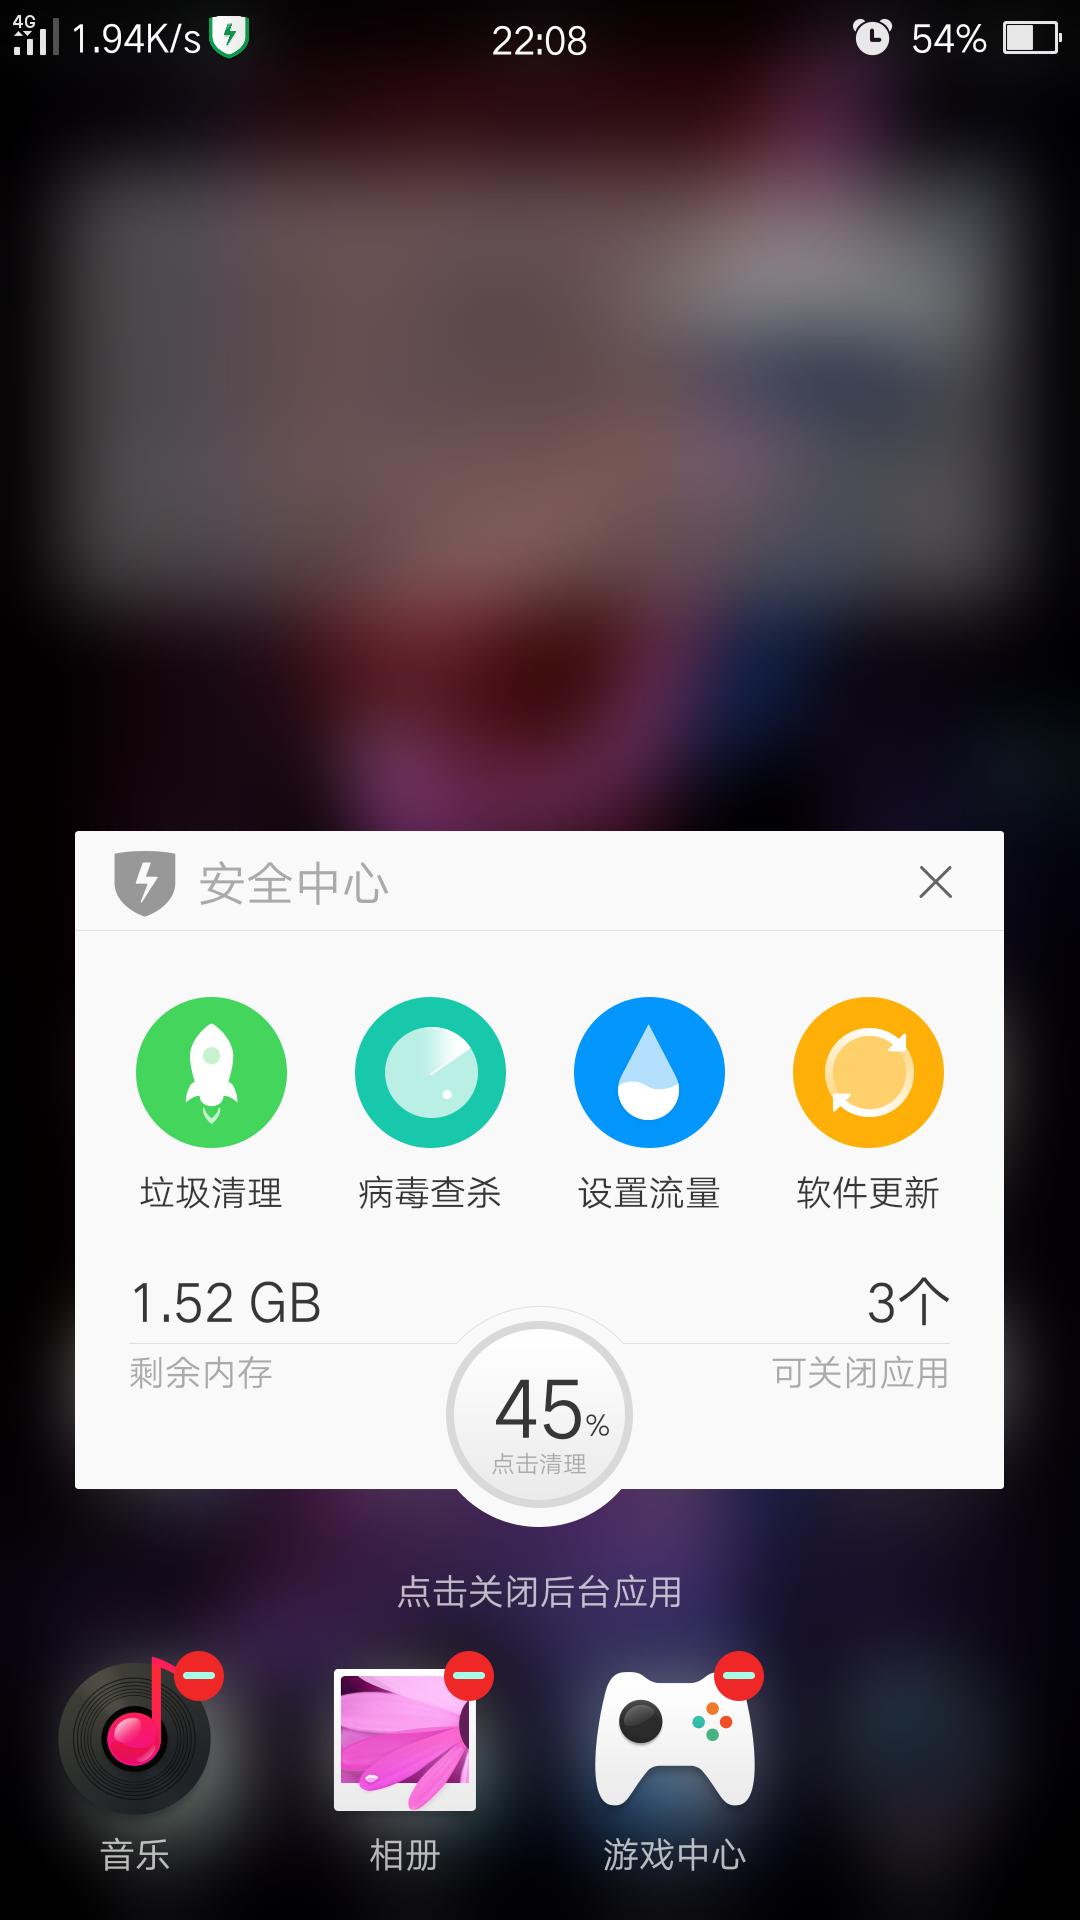 Screenshot_2015-09-14-22-08-17-64.png